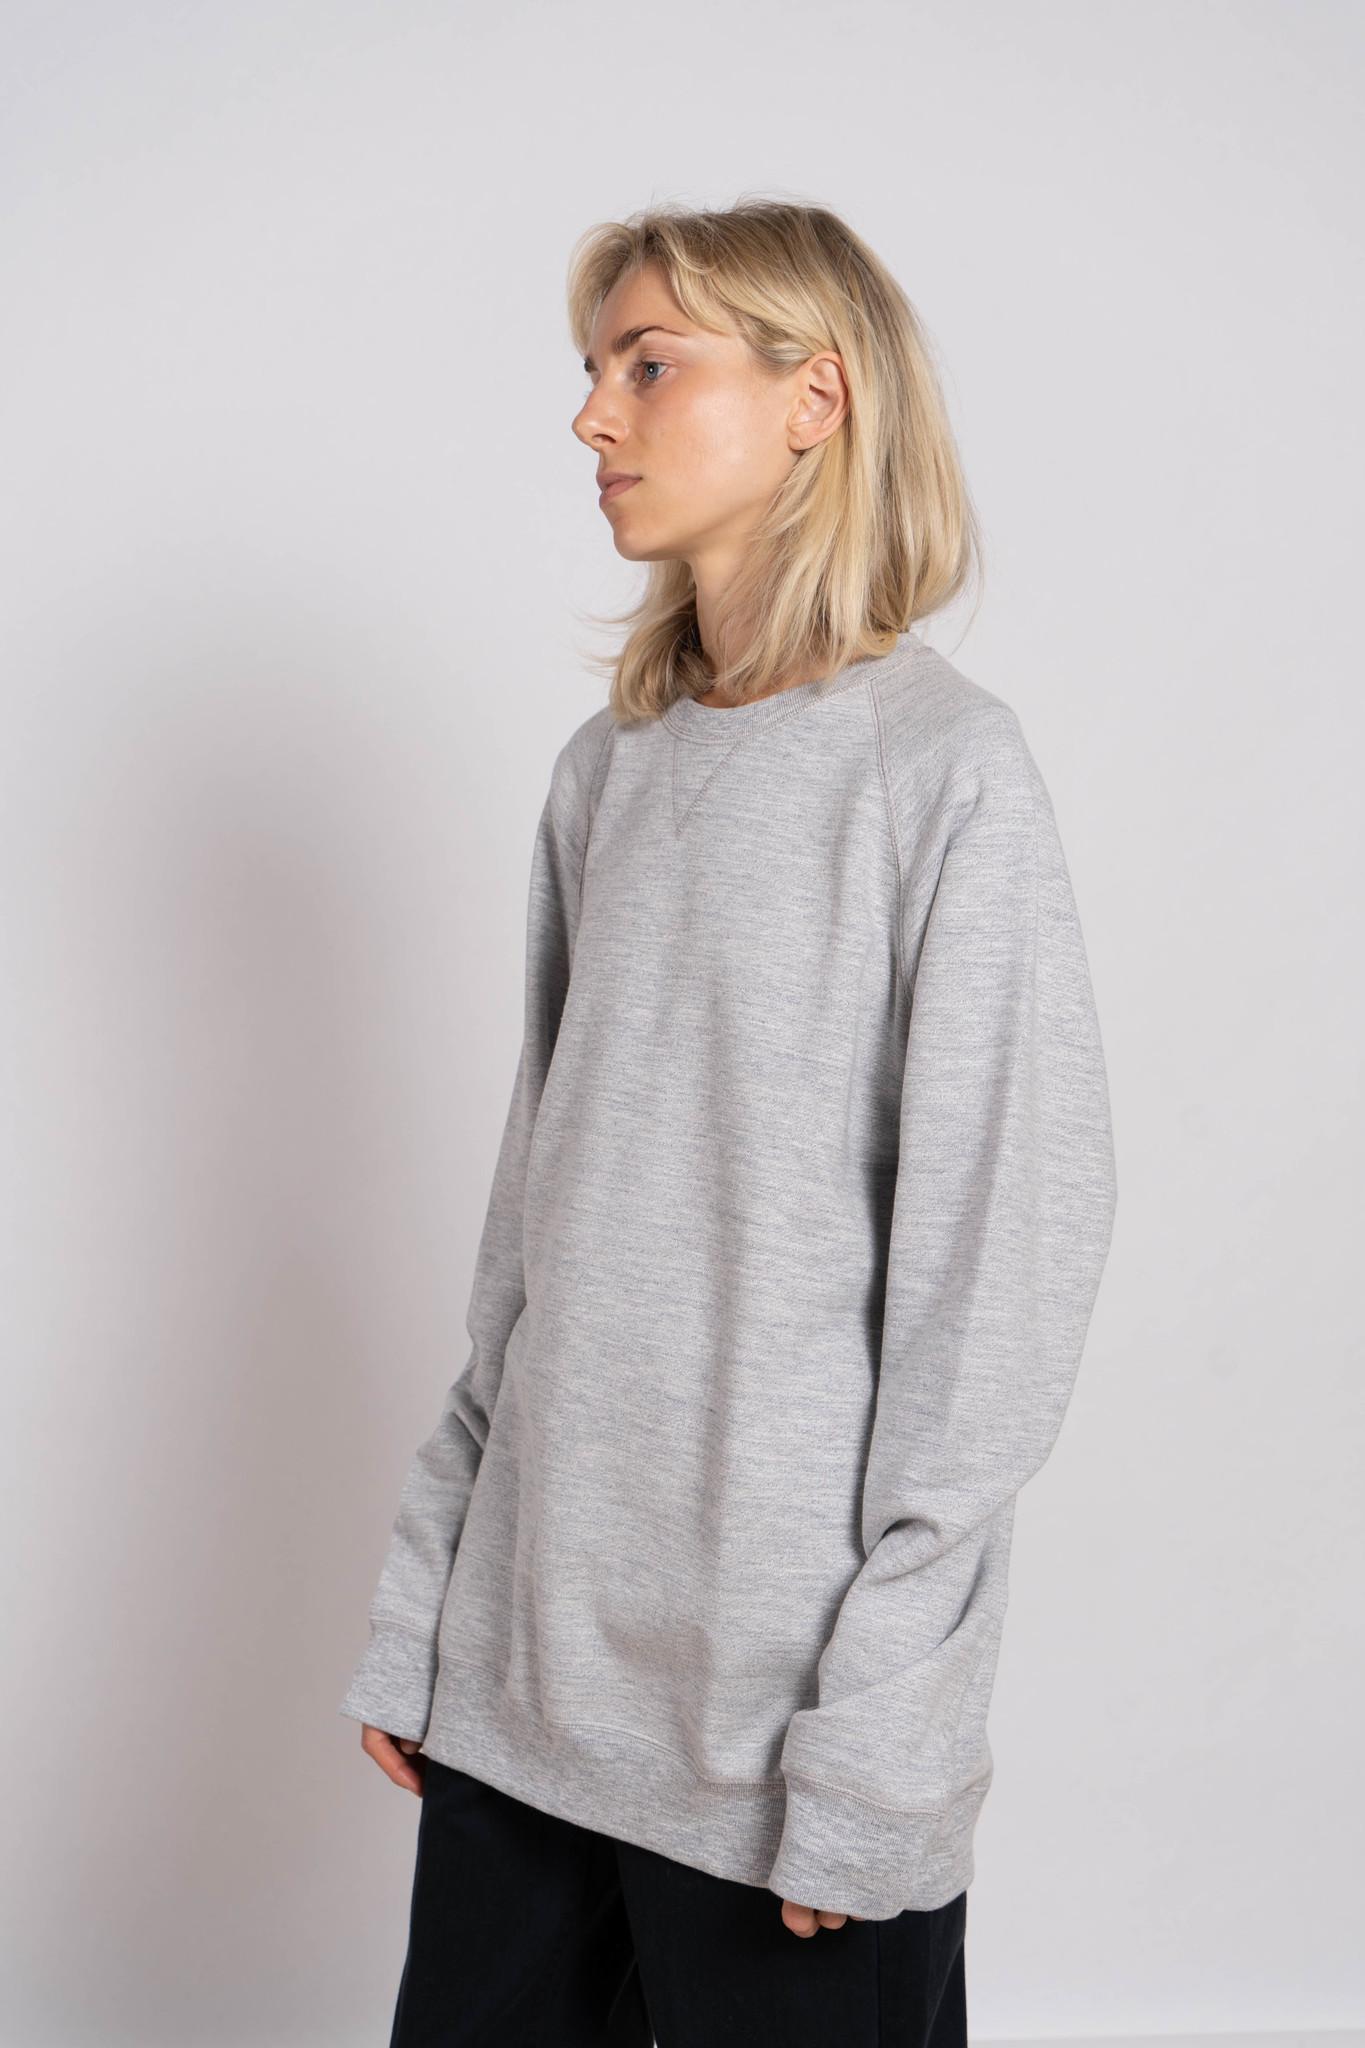 Joe Sweater Grey Melange 'Ibiza Ski Club'